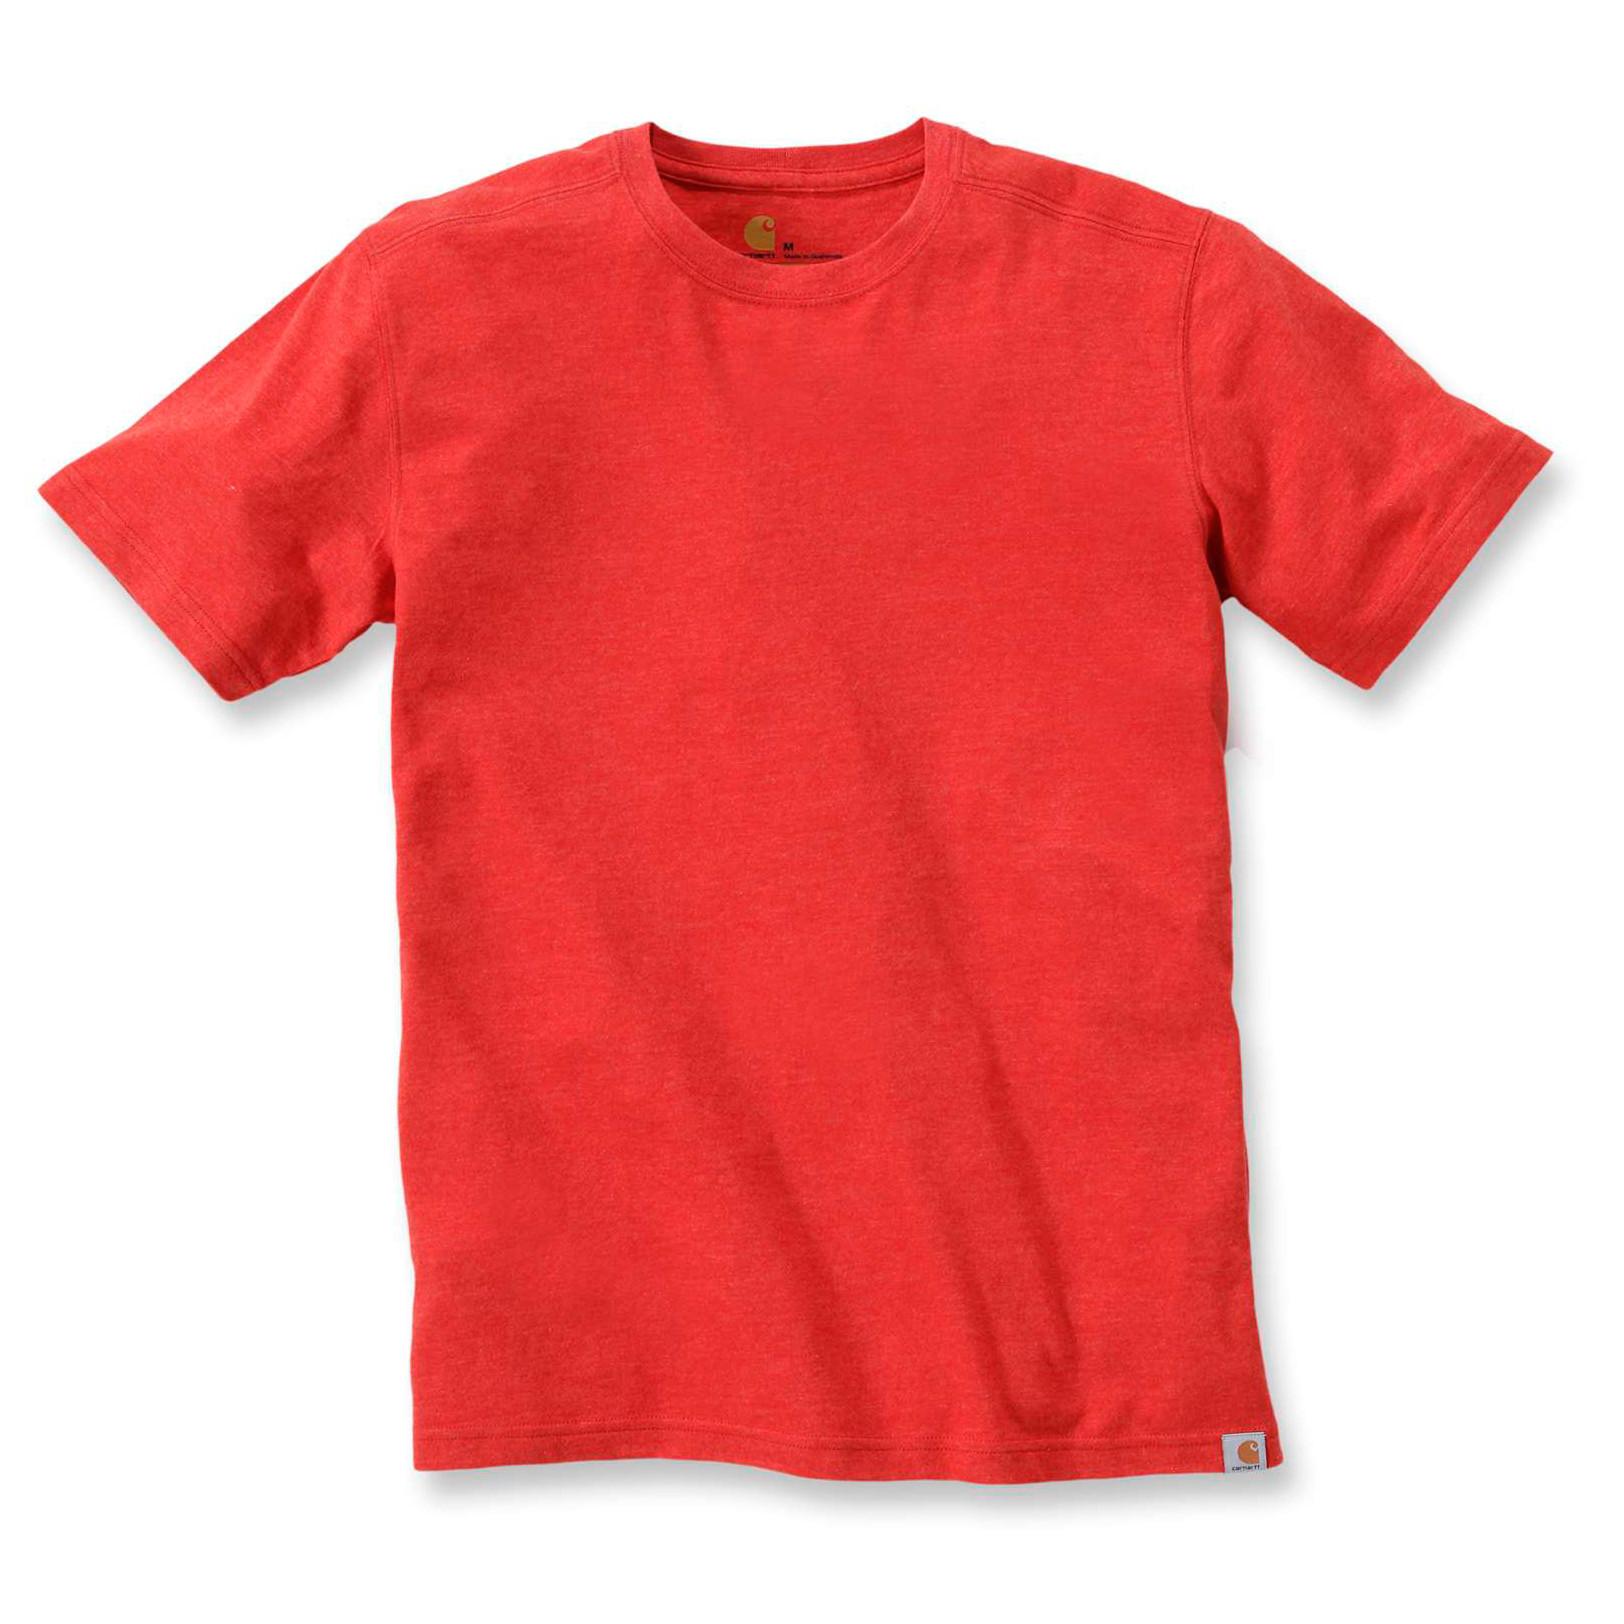 Футболка Carhartt Maddock T-Shirt S/S - 101124 (Chili Heather, S)